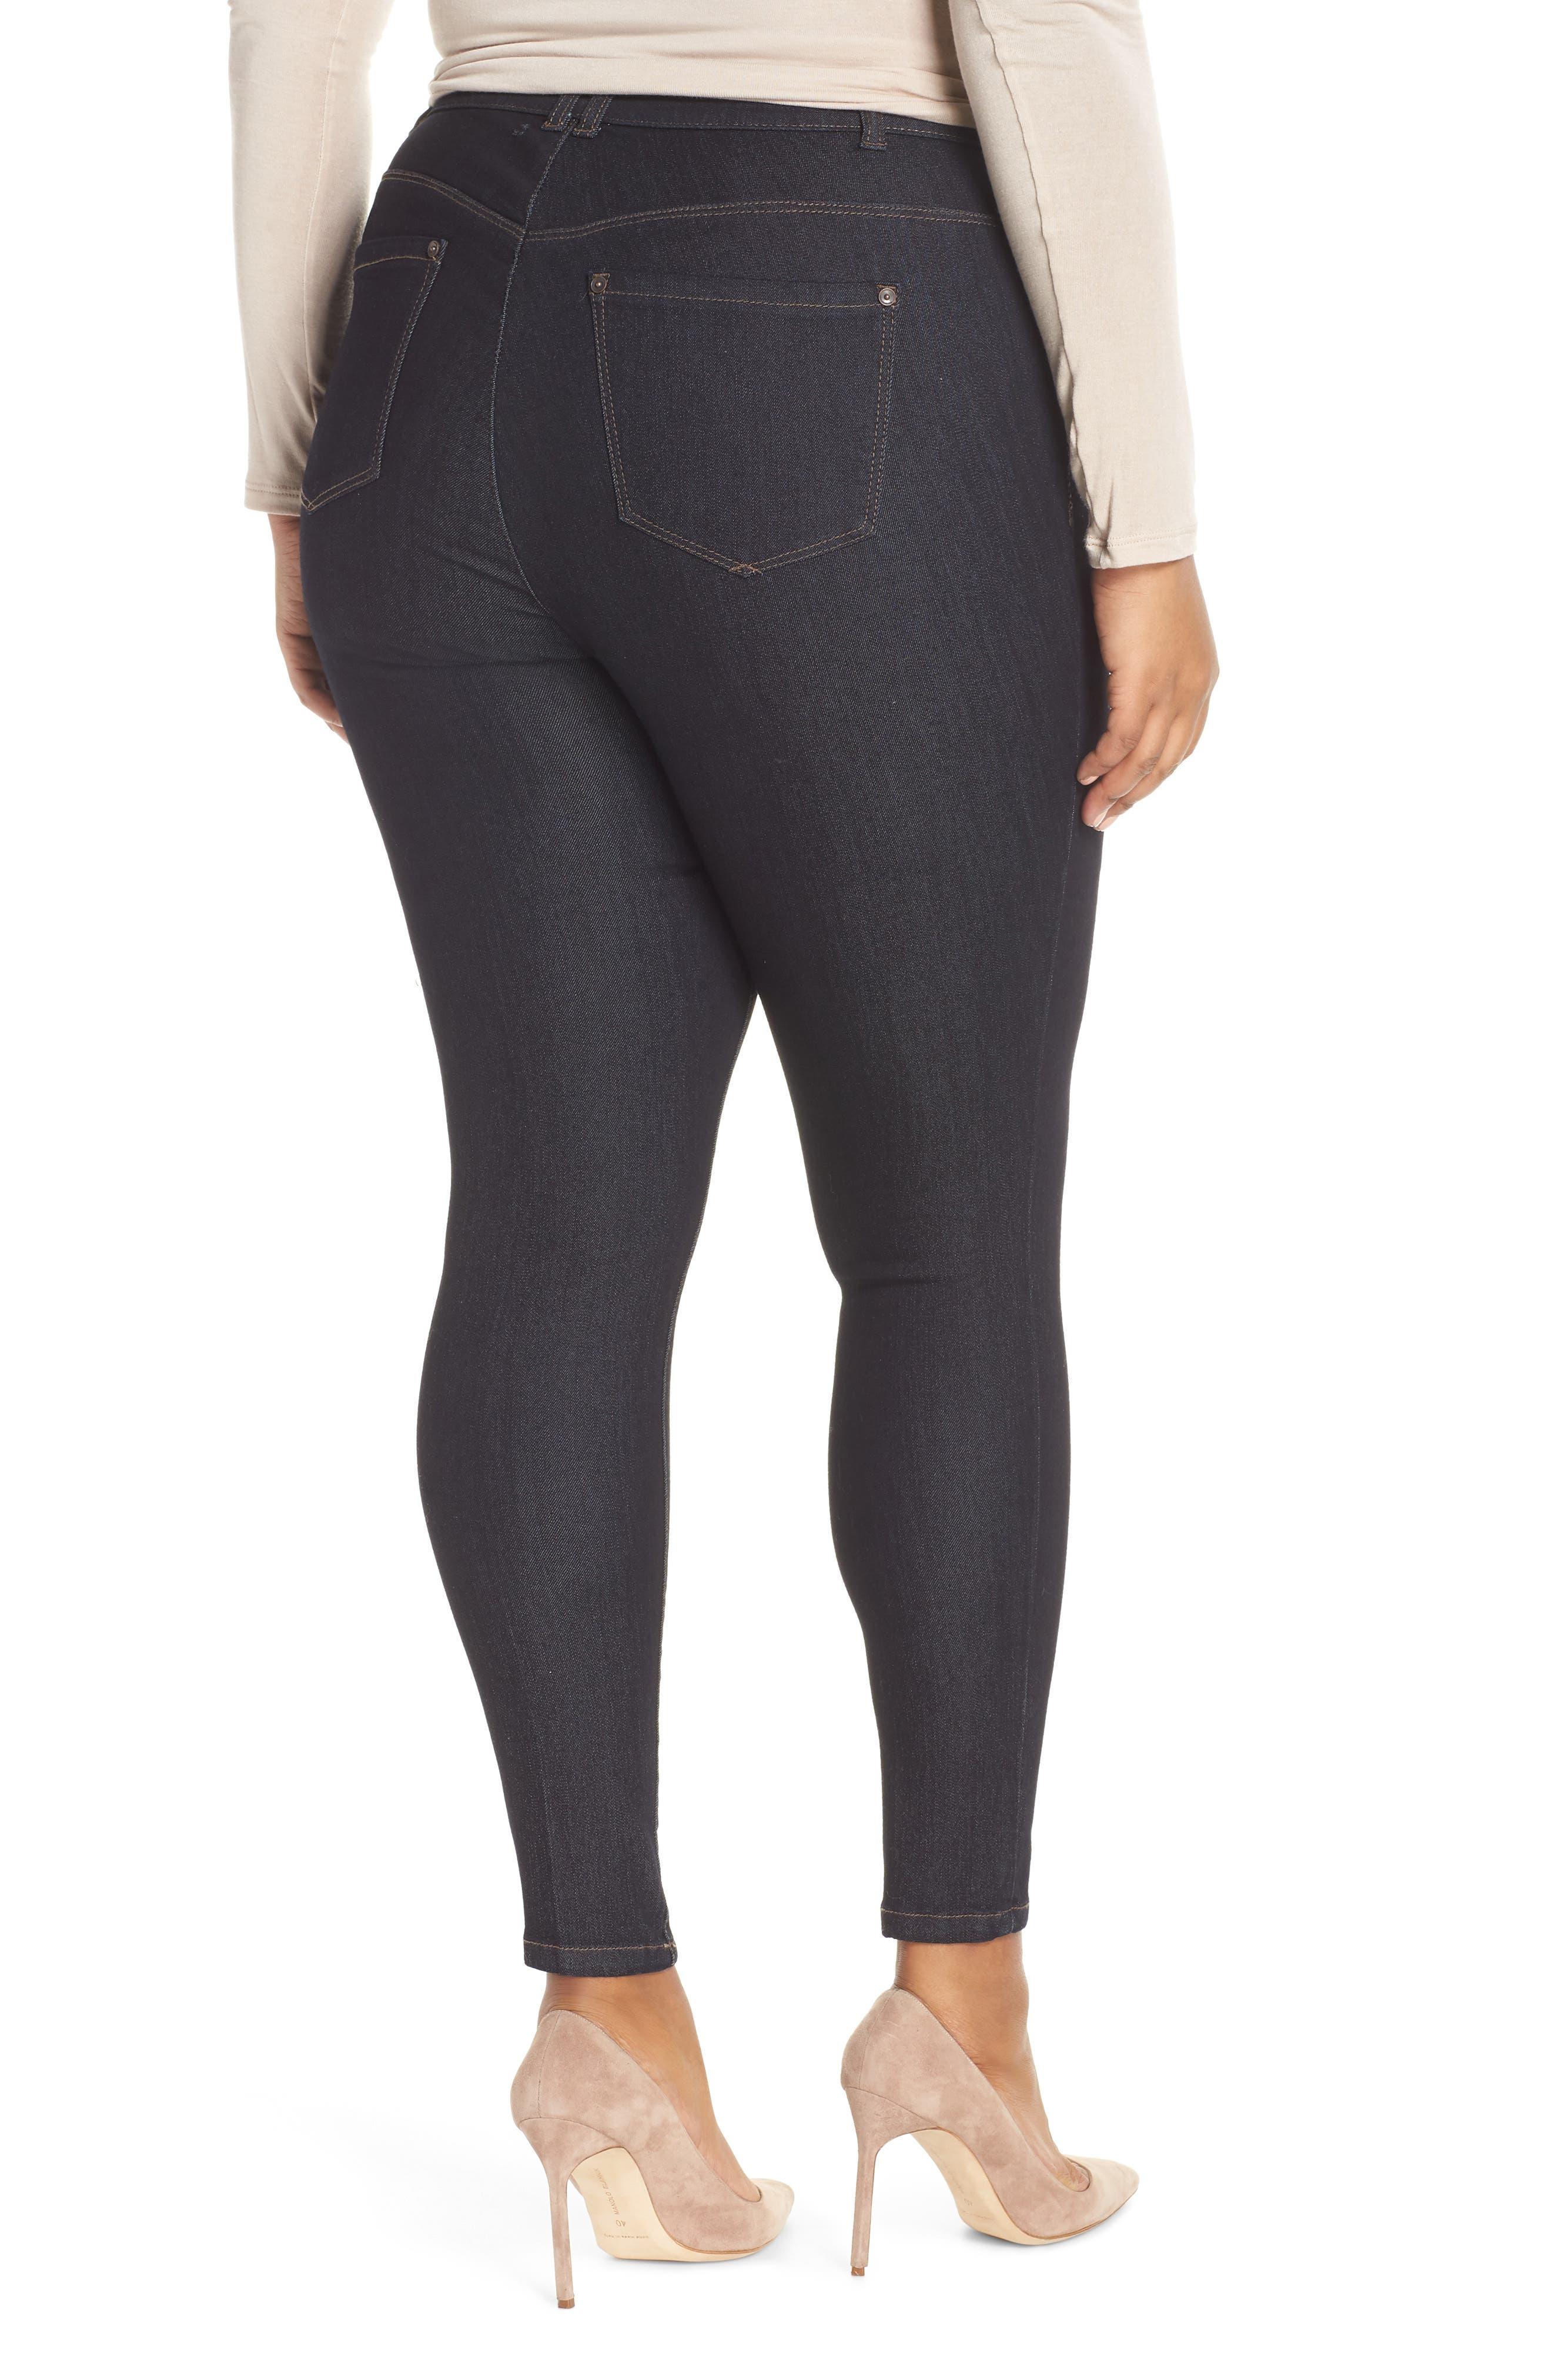 30/11 Ab-solution High Waist Skinny Jeans,                             Alternate thumbnail 2, color,                             INDIGO